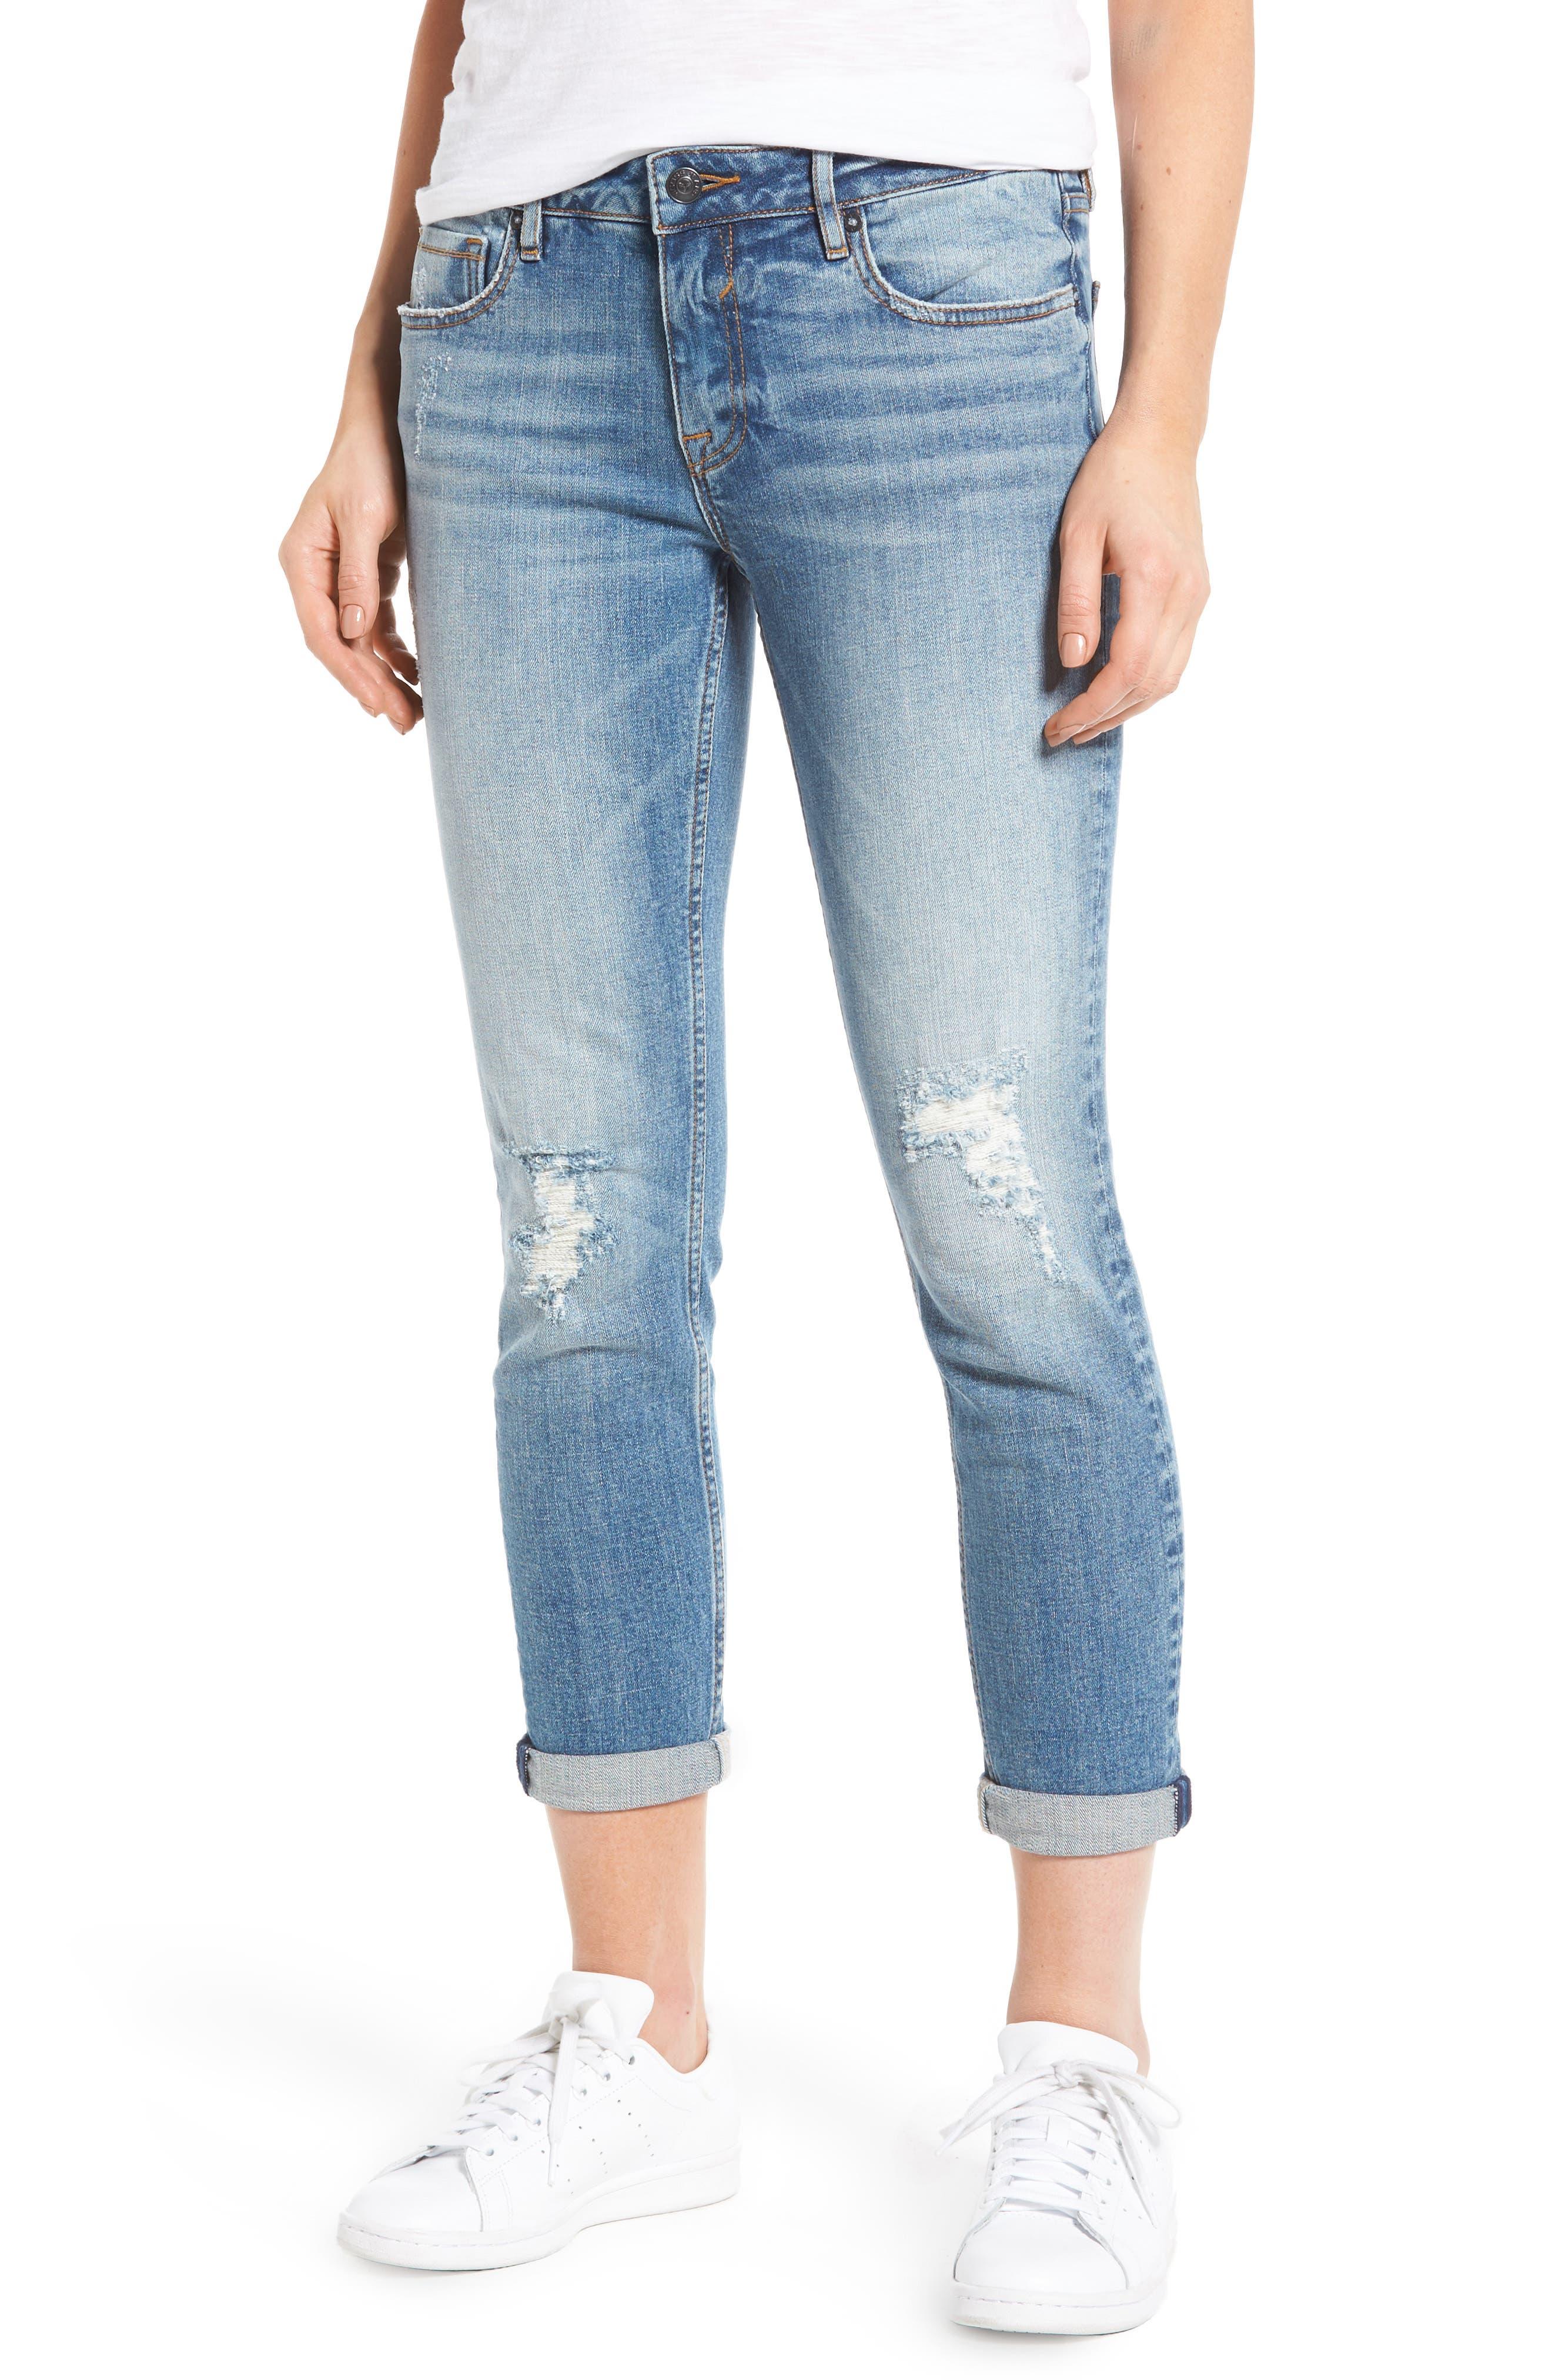 Alternate Image 1 Selected - Vigoss Tomboy Ripped Skinny Jeans